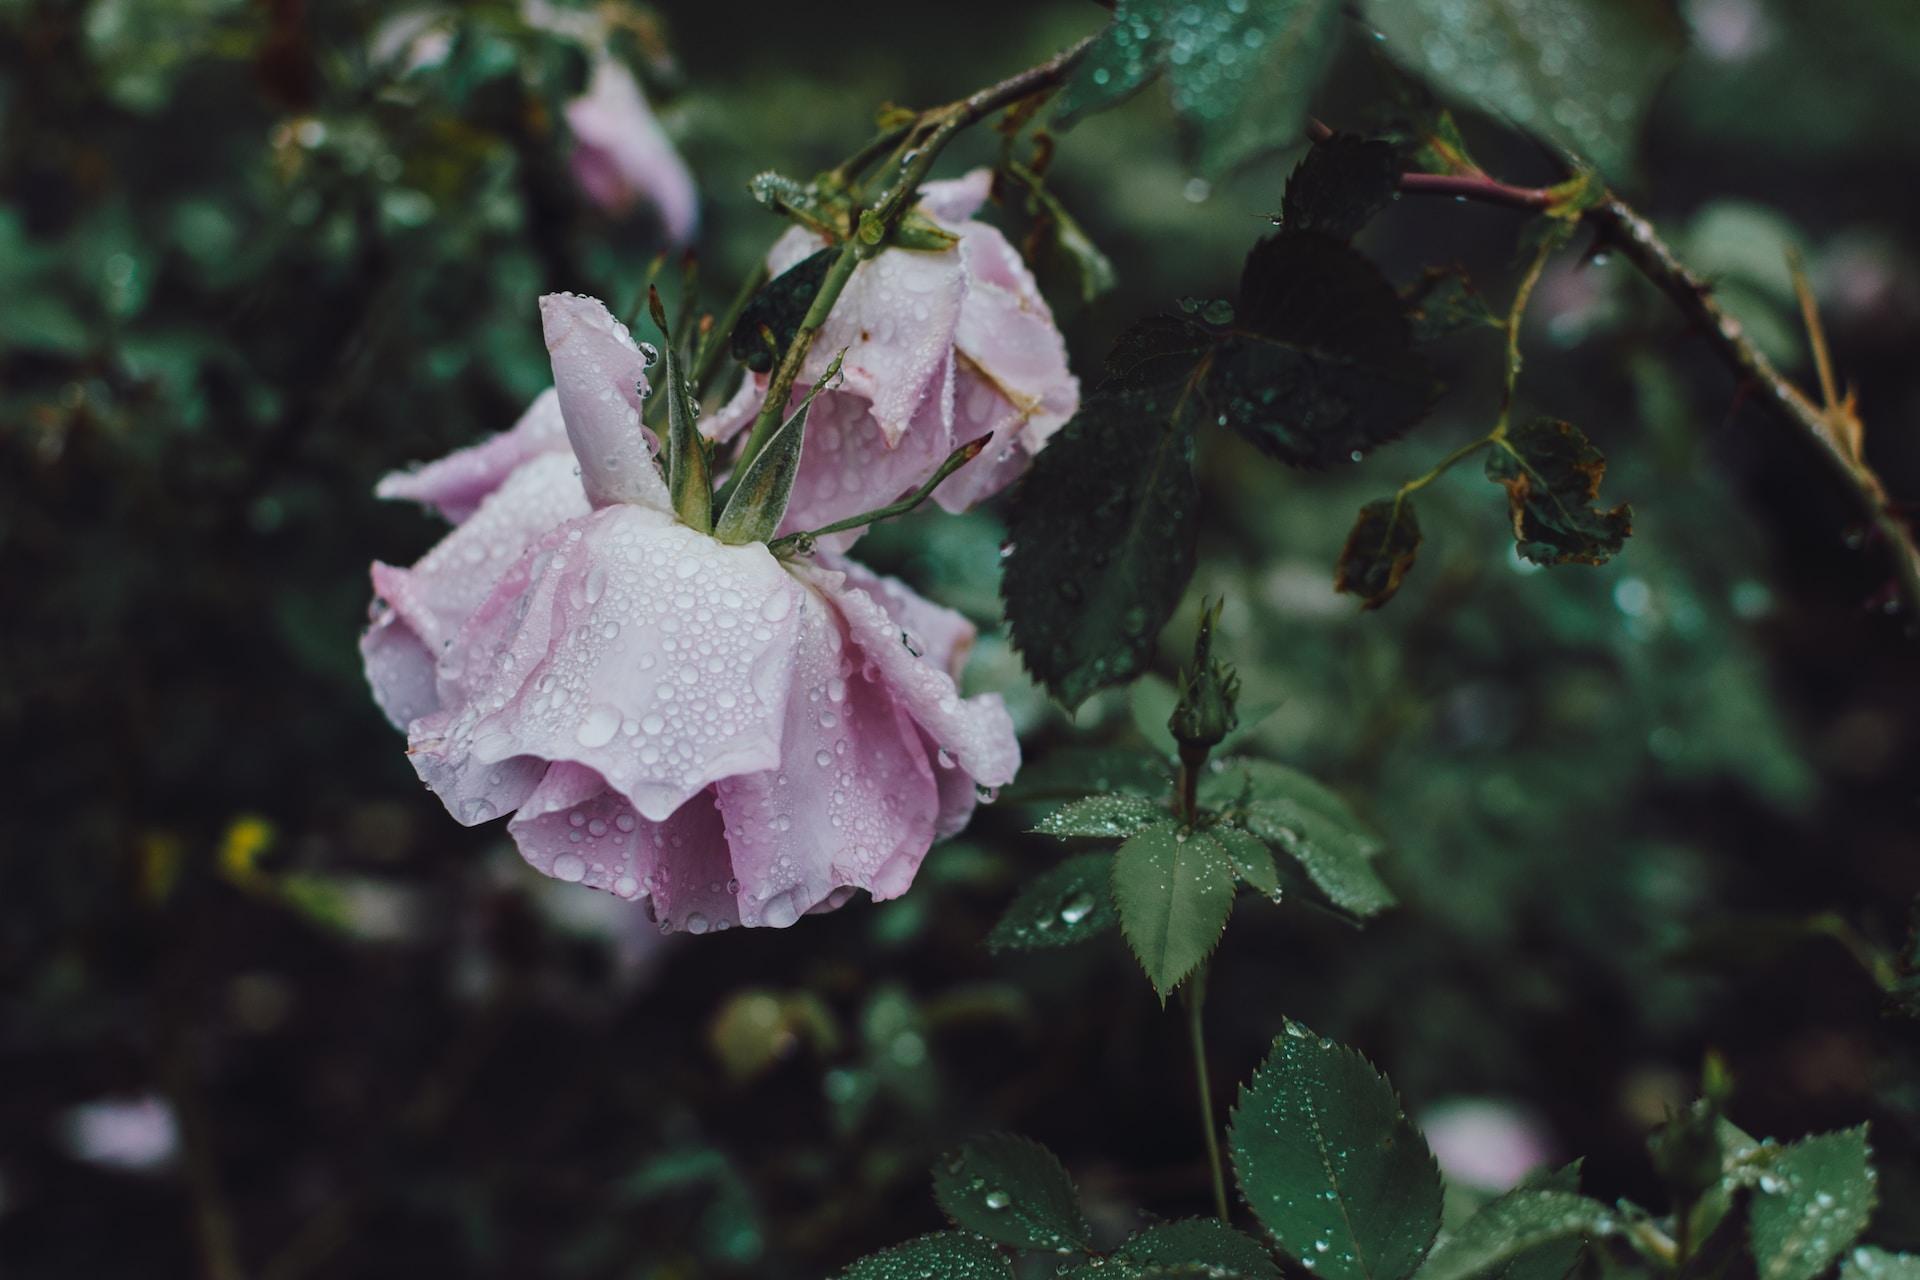 closeup photography of pink petaled flower